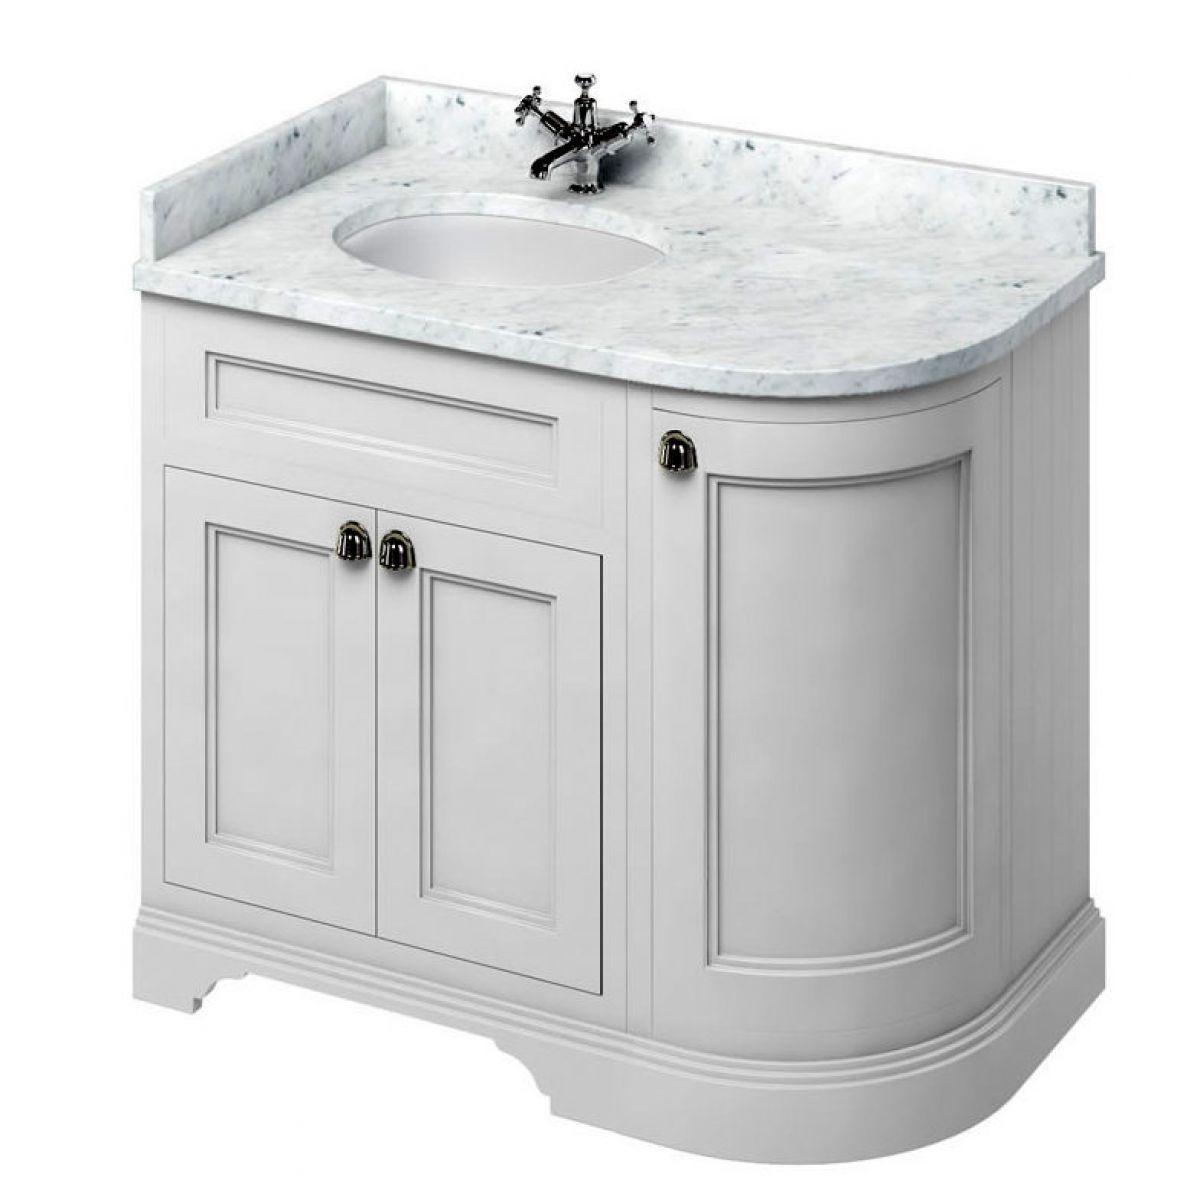 Curved bathroom vanity -  Burlington 100 Curved Vanity Unit